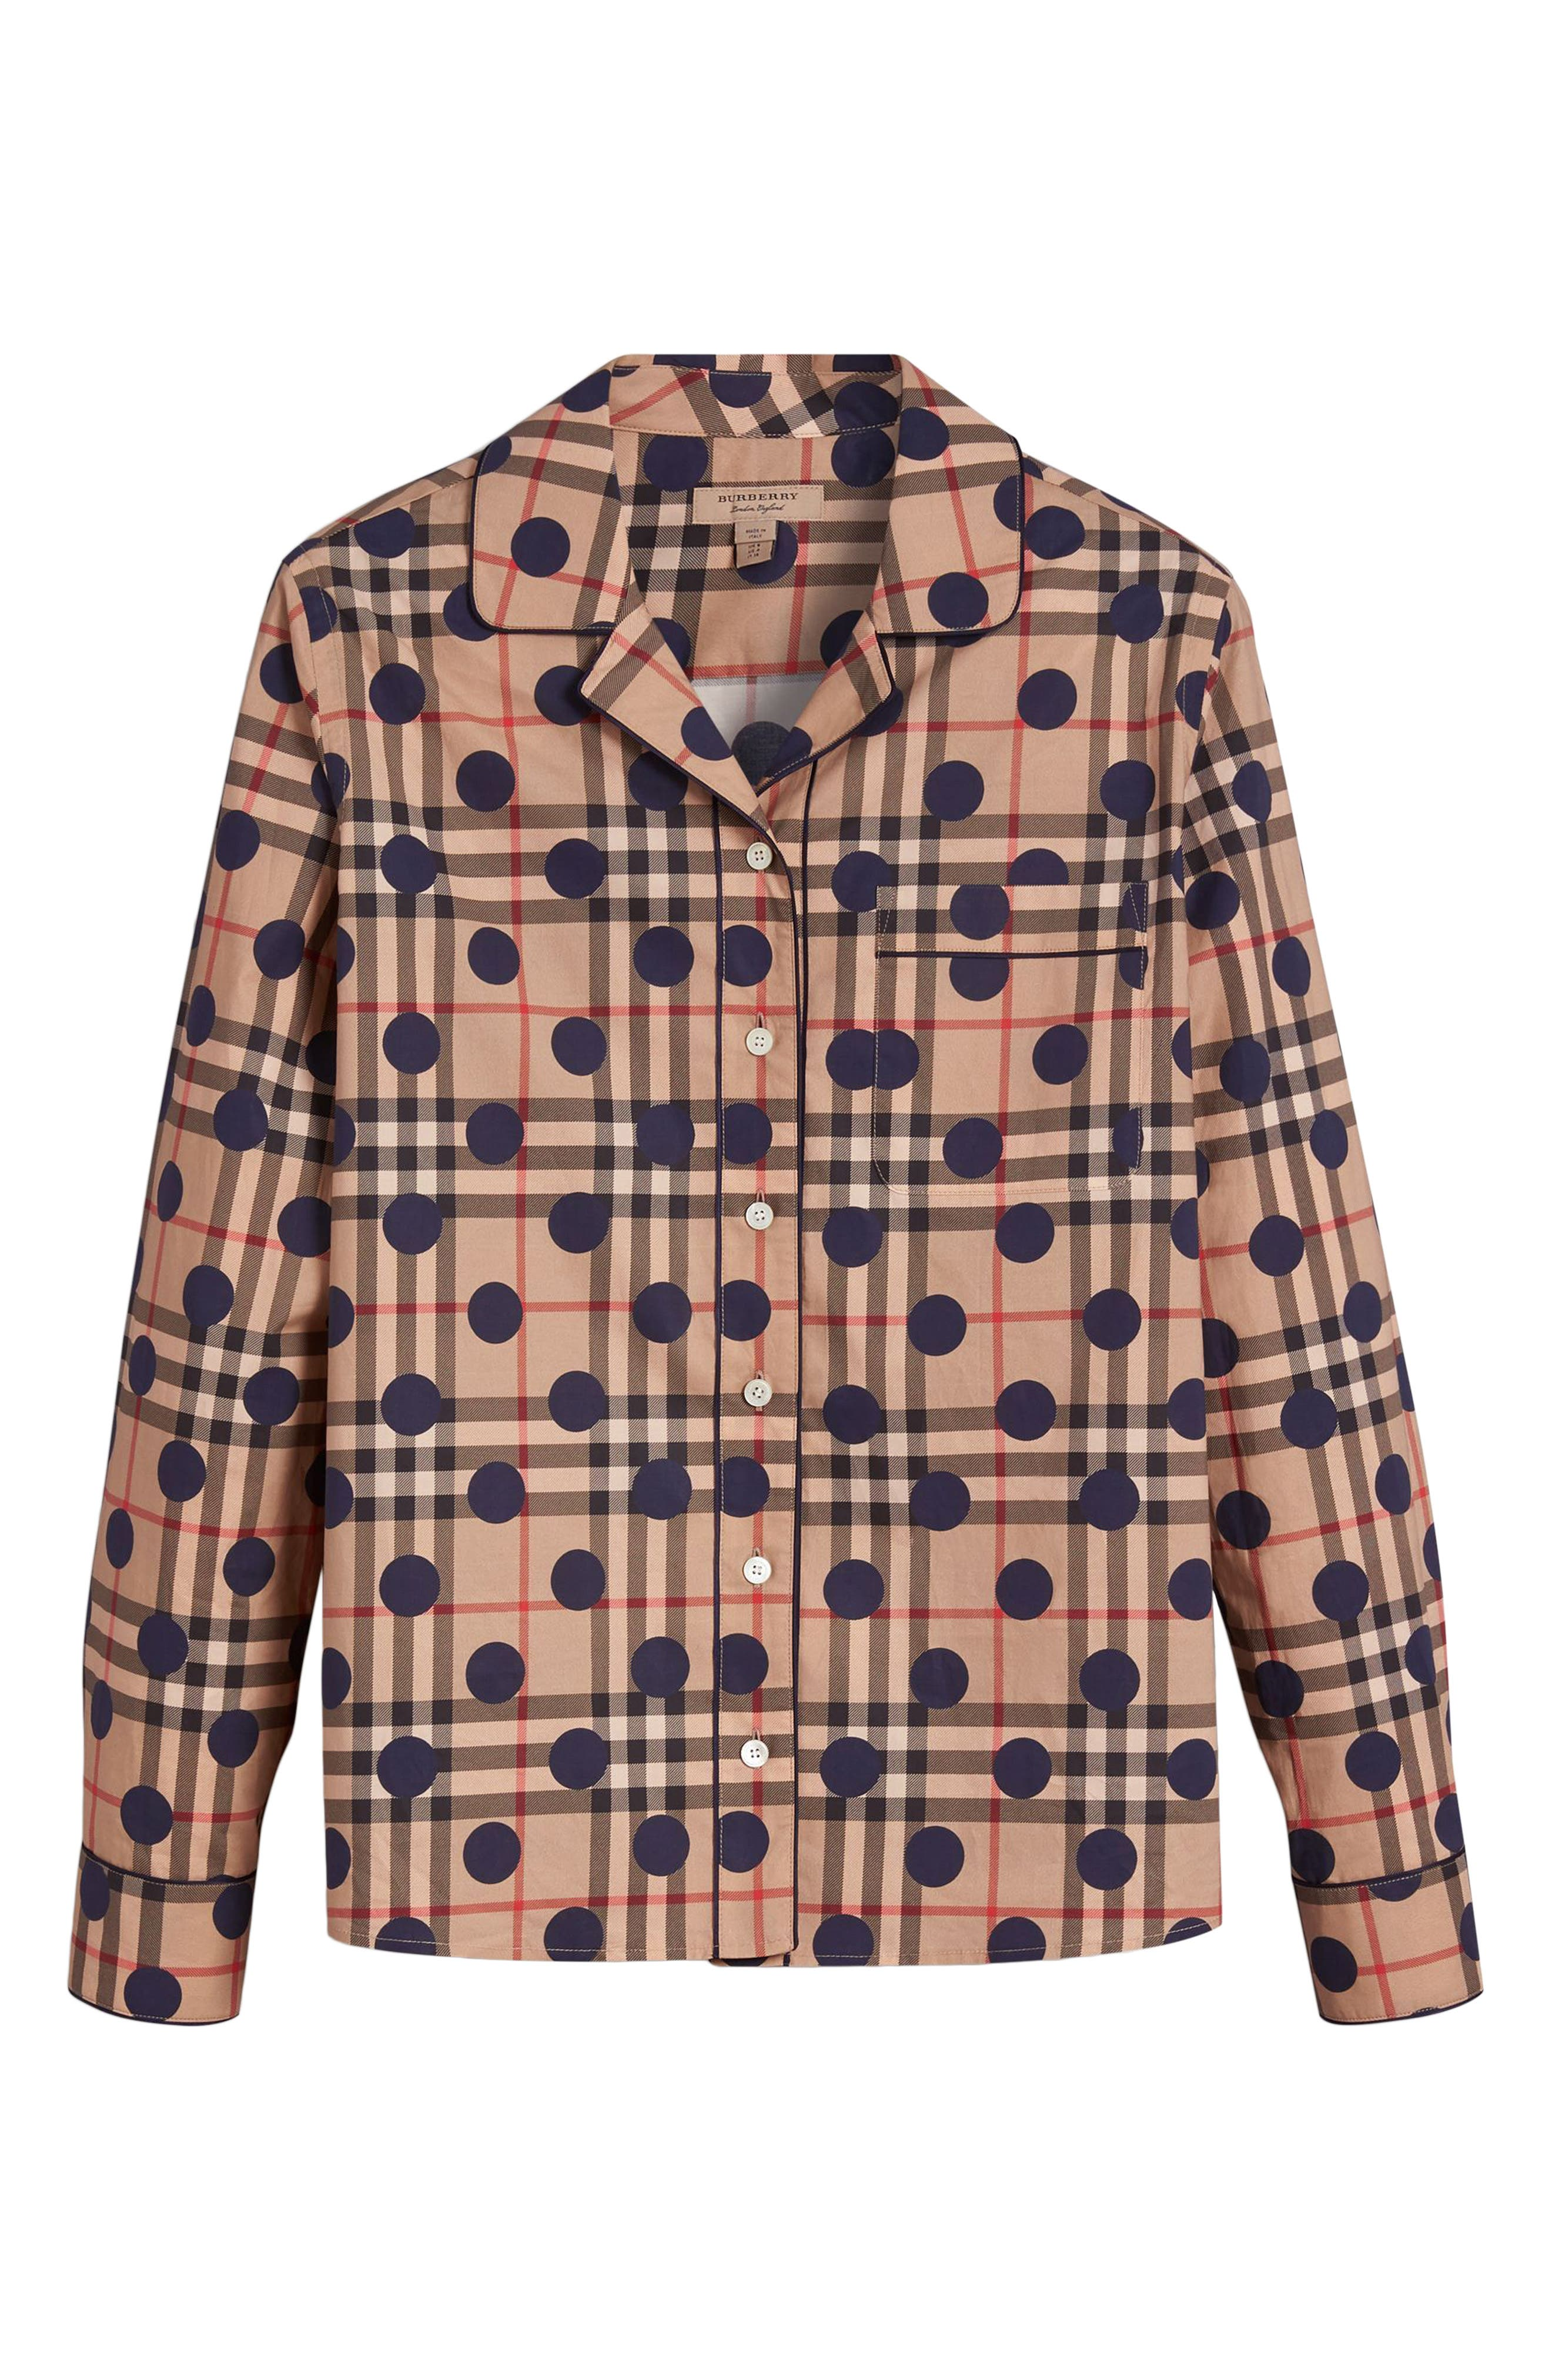 Polka Dot Check Print Cotton Shirt,                             Alternate thumbnail 7, color,                             Camel Multi